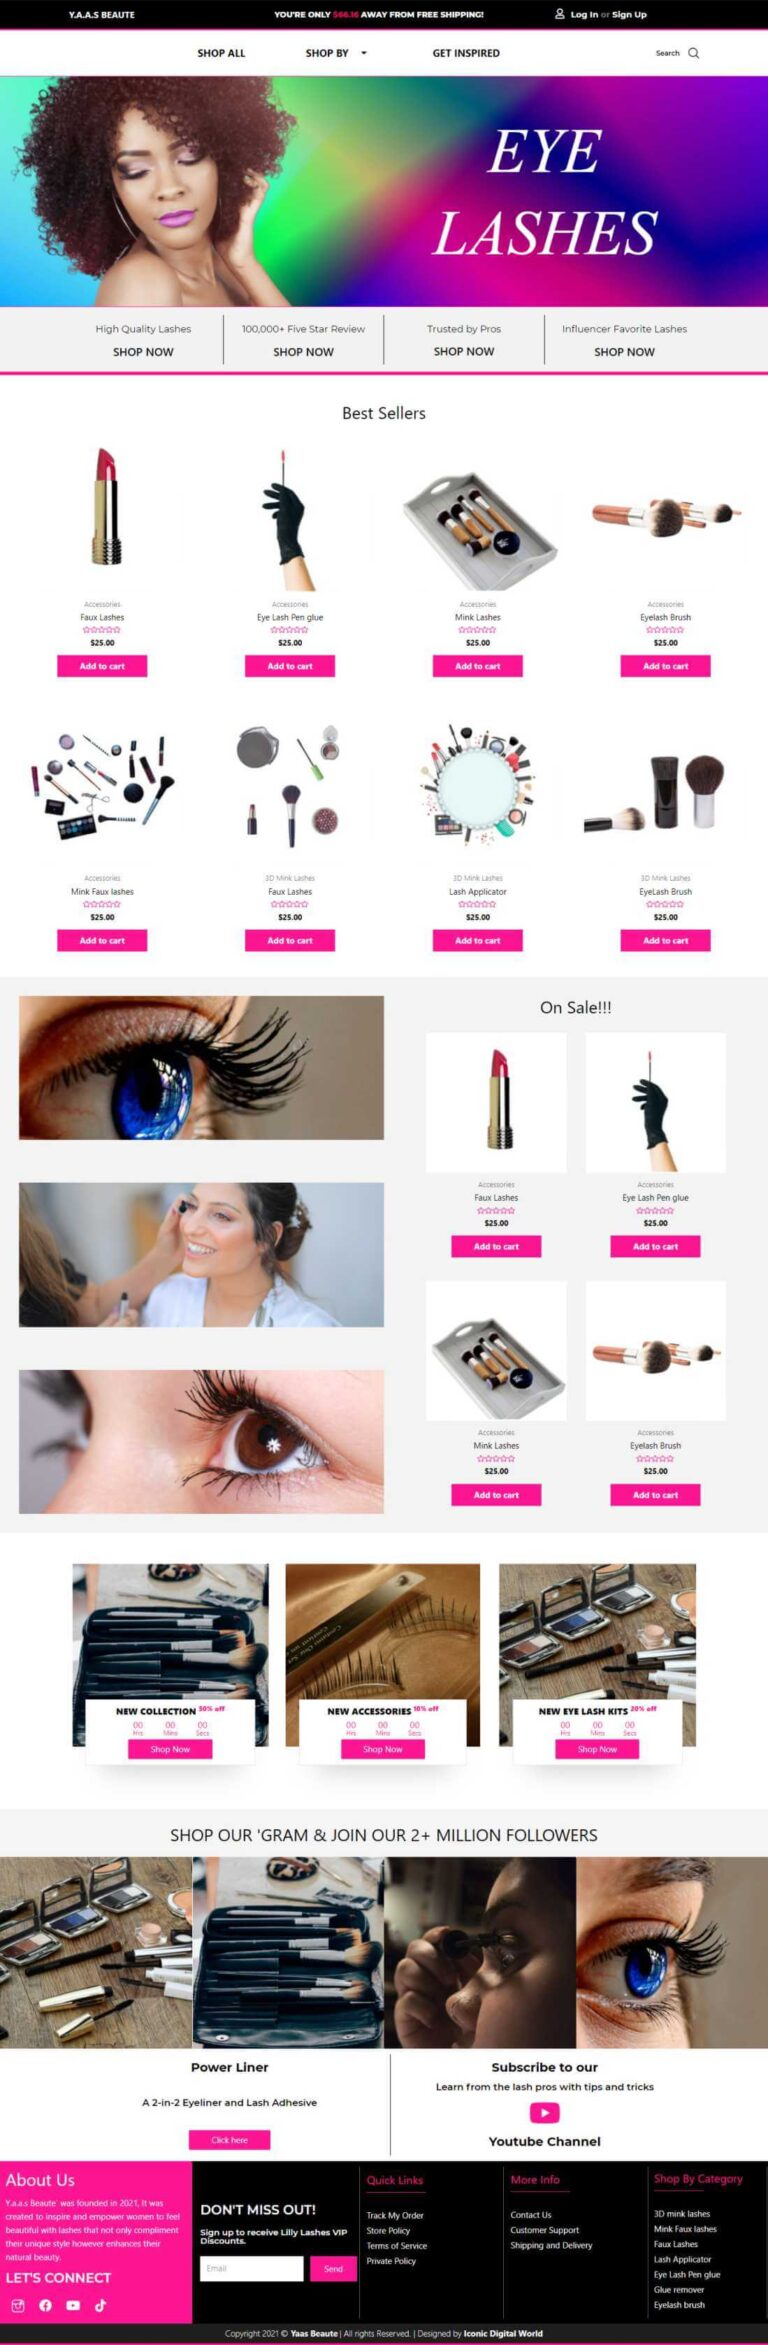 Y.a.a.s Website Design - Homepage